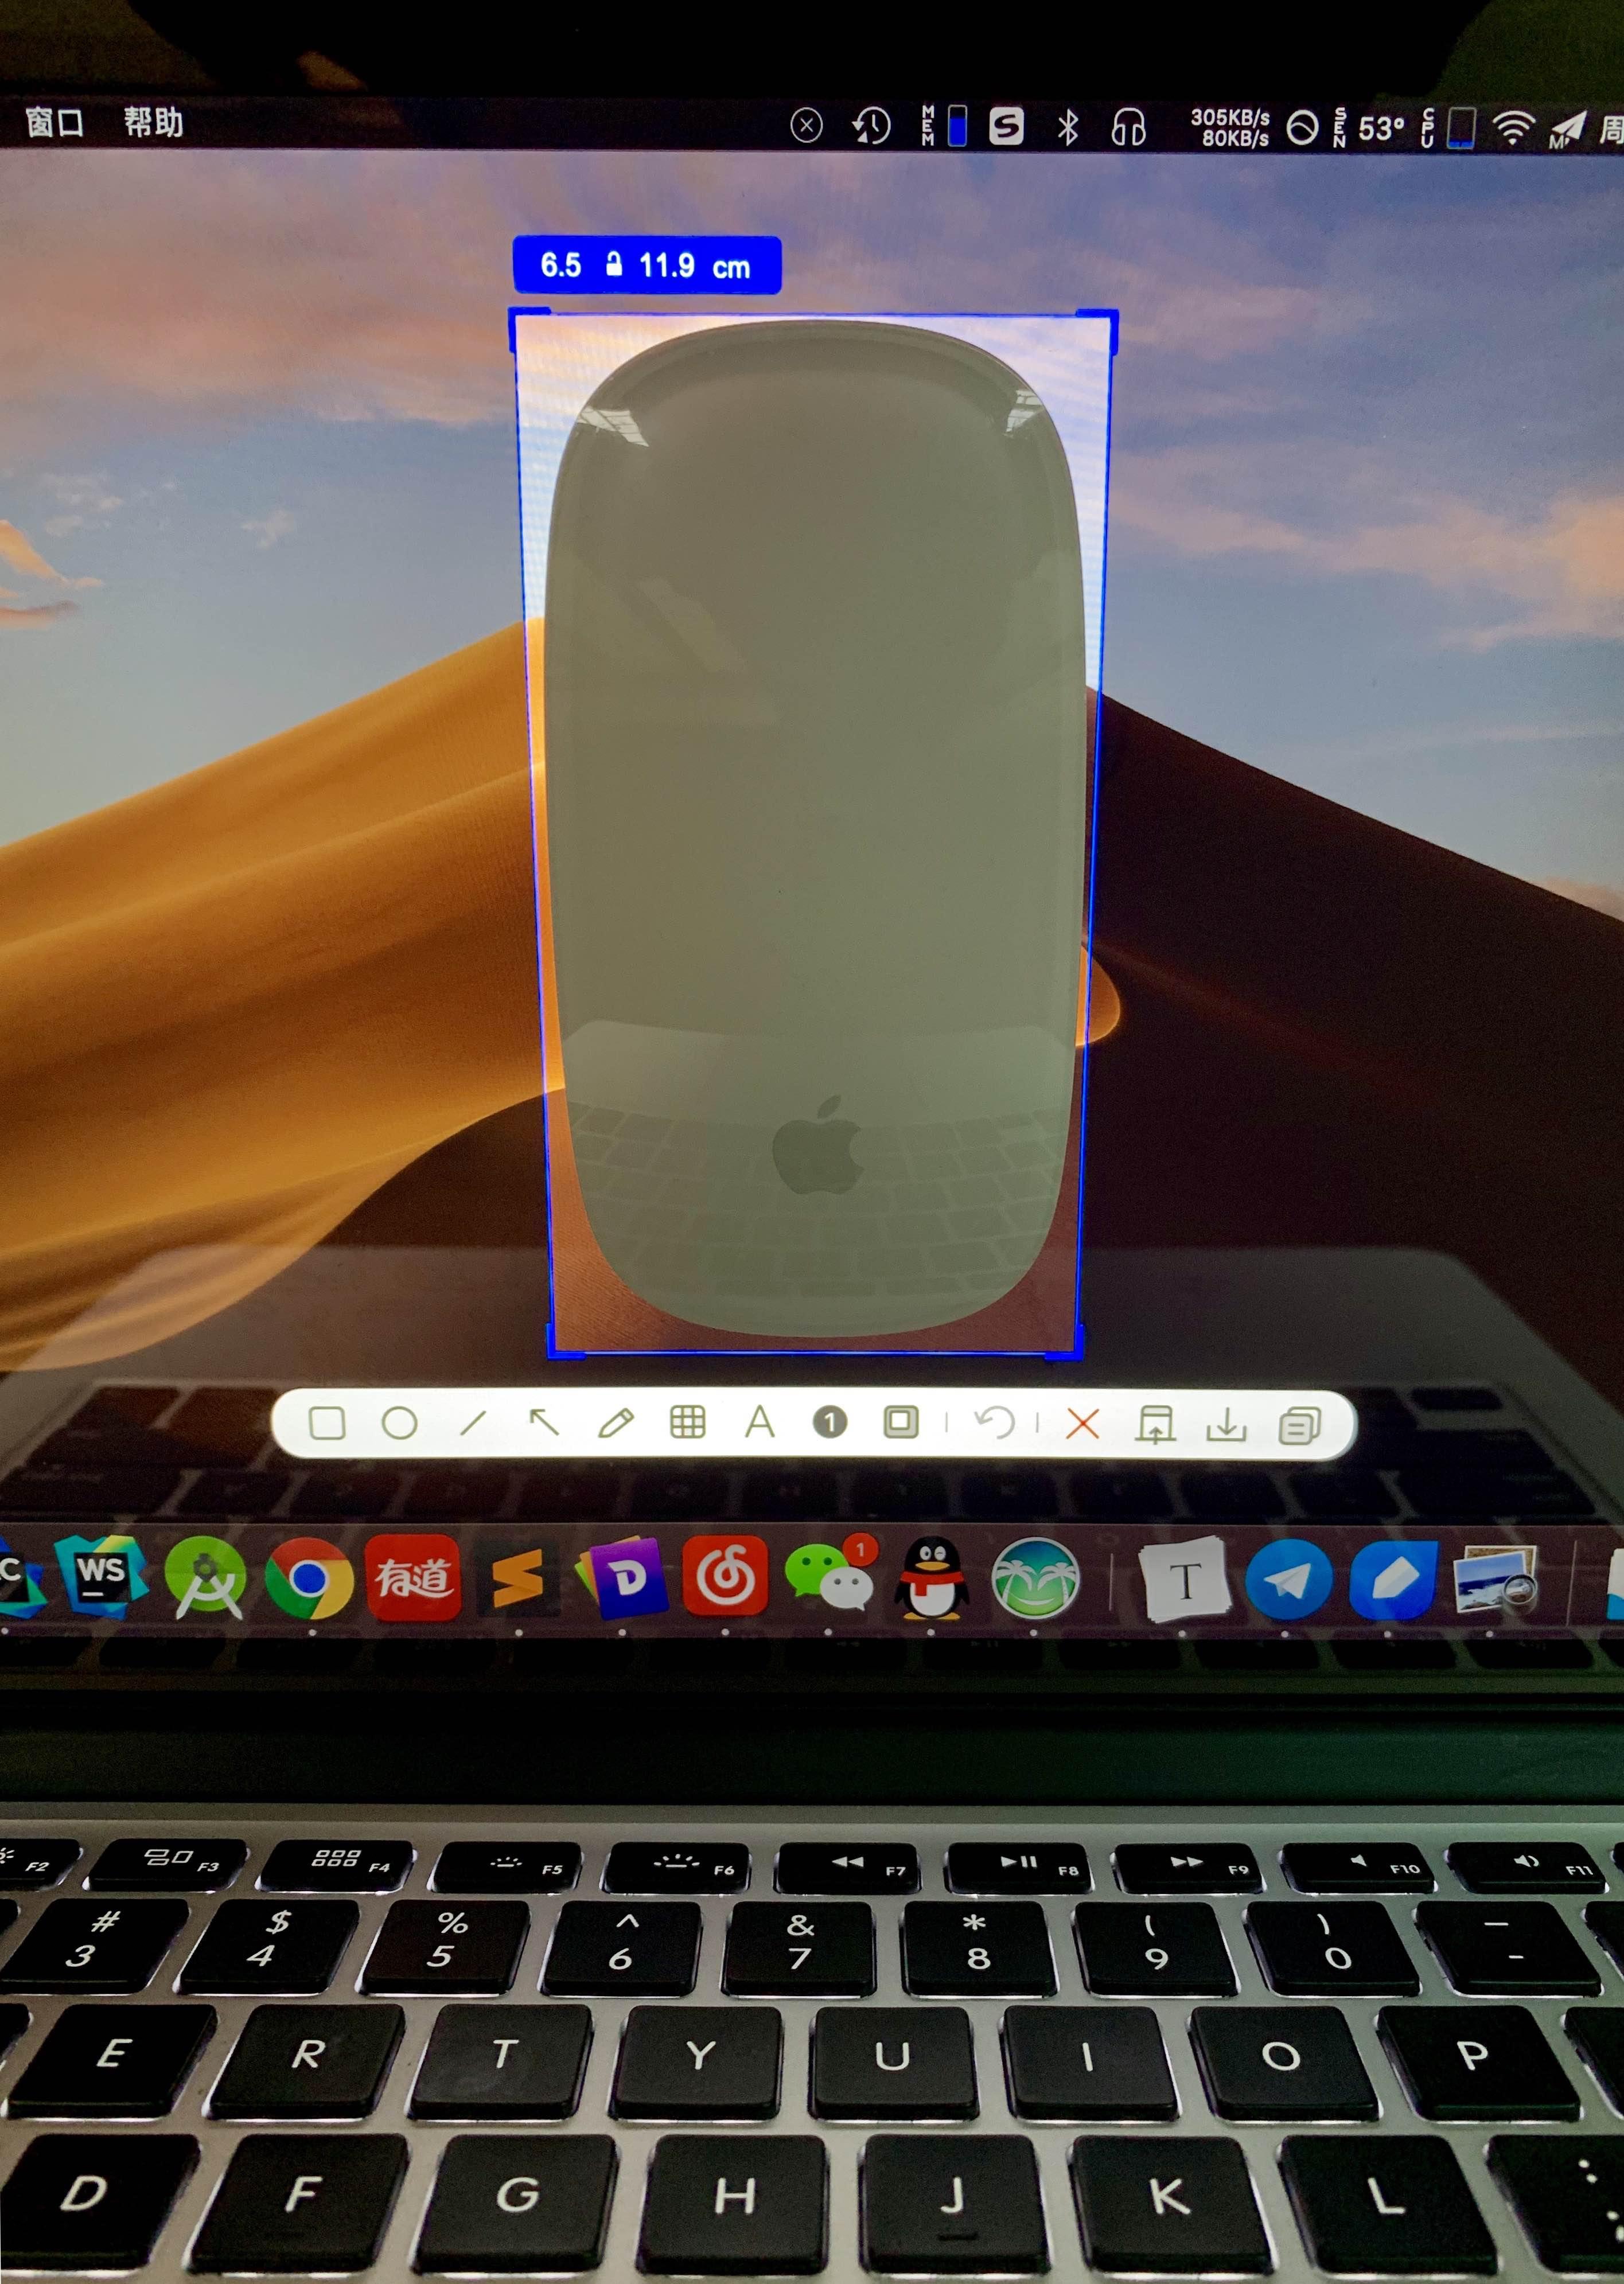 Xnip 量 Magic Mouse.jpg